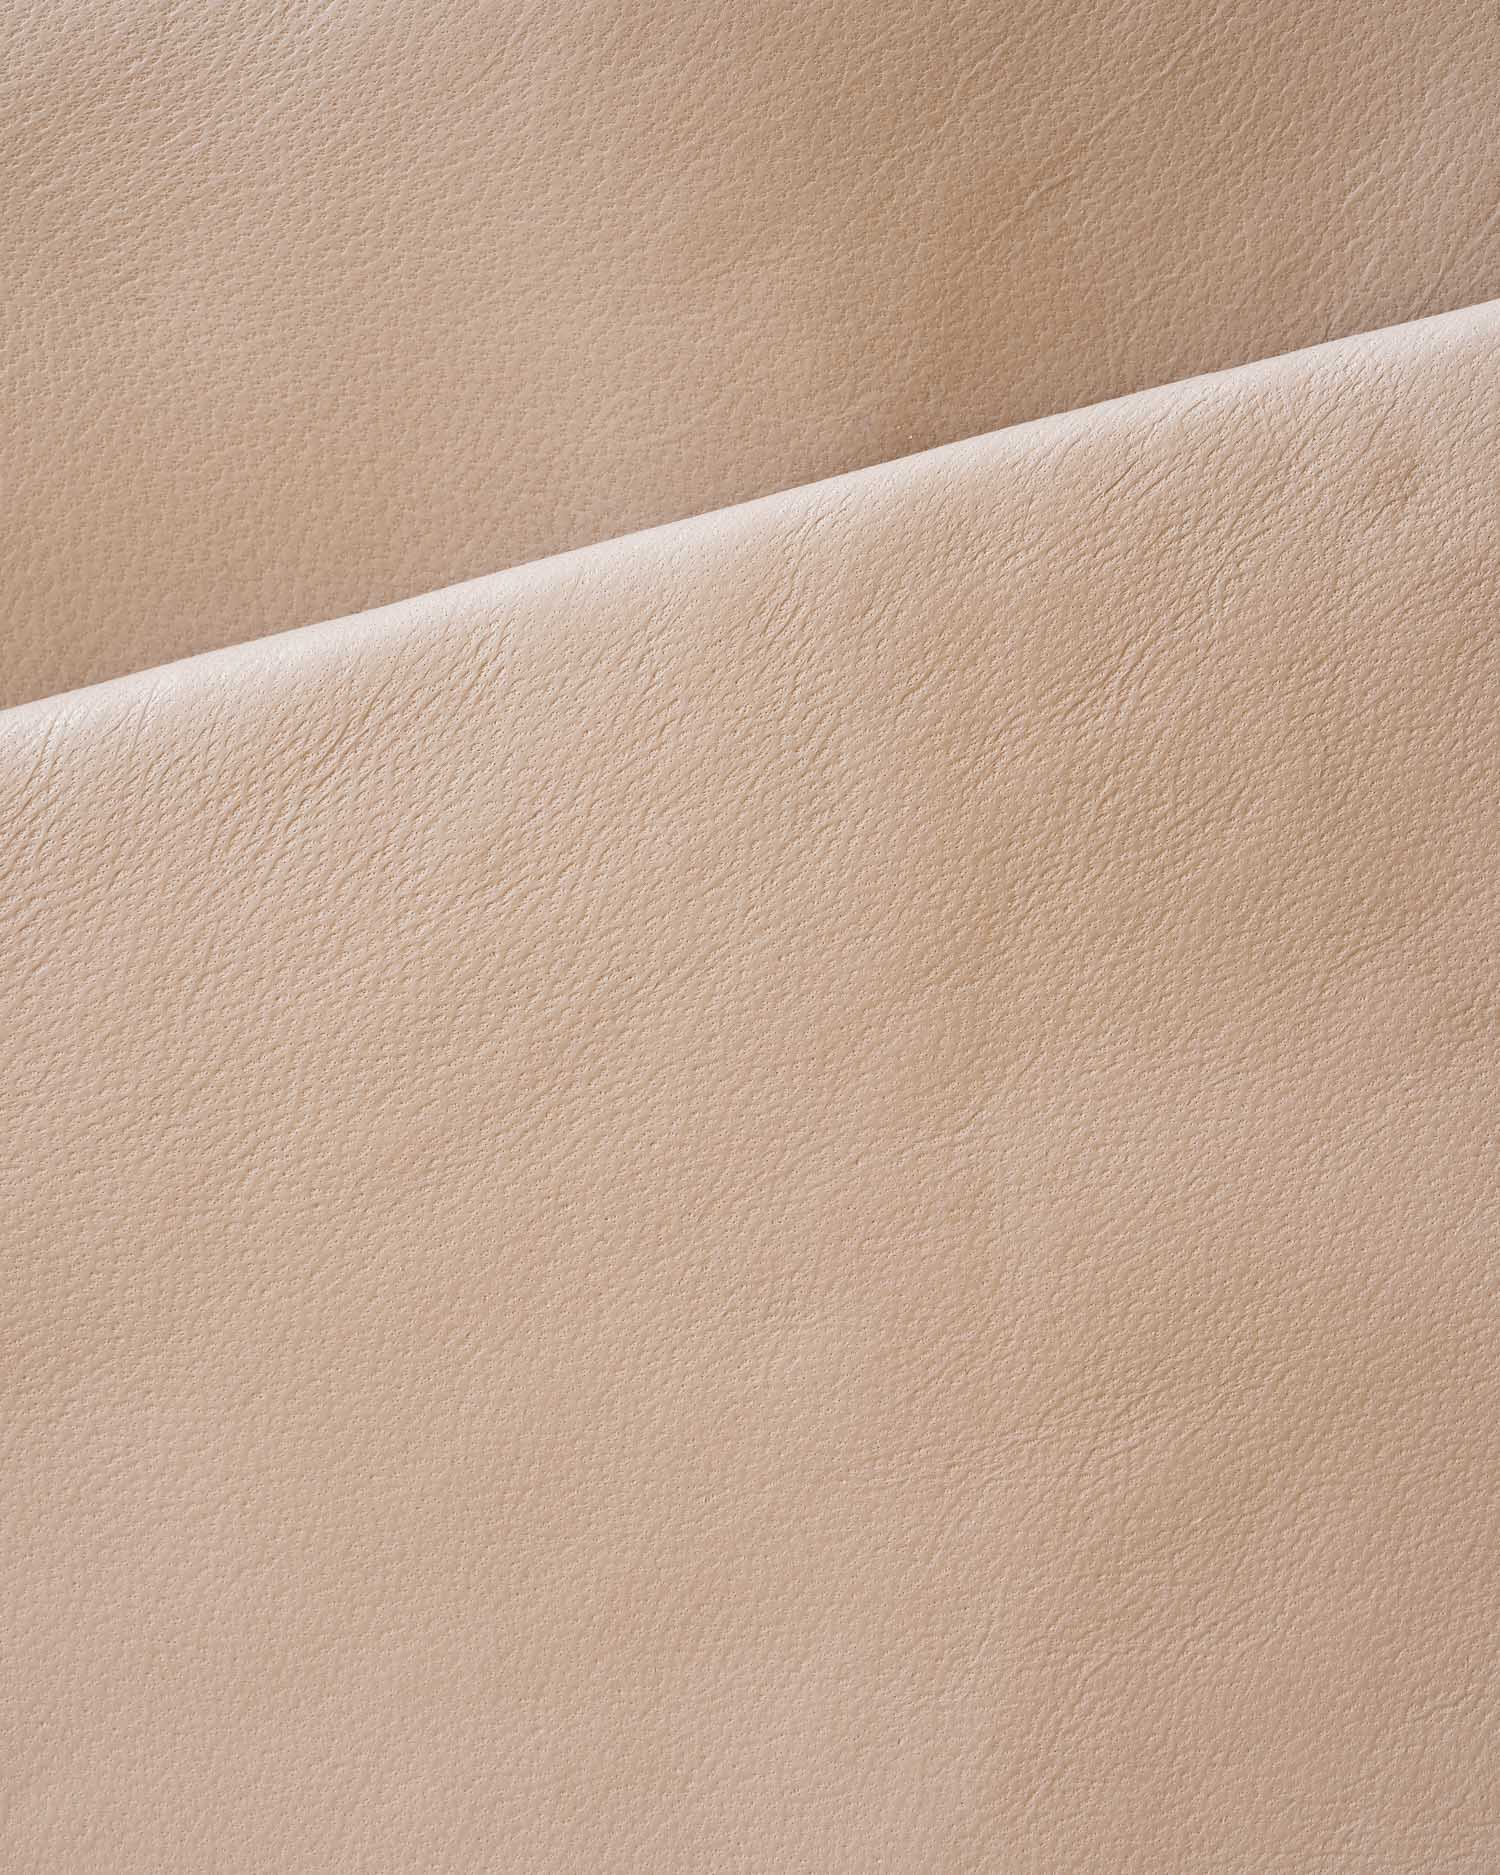 Baggizmo italian nappa leather